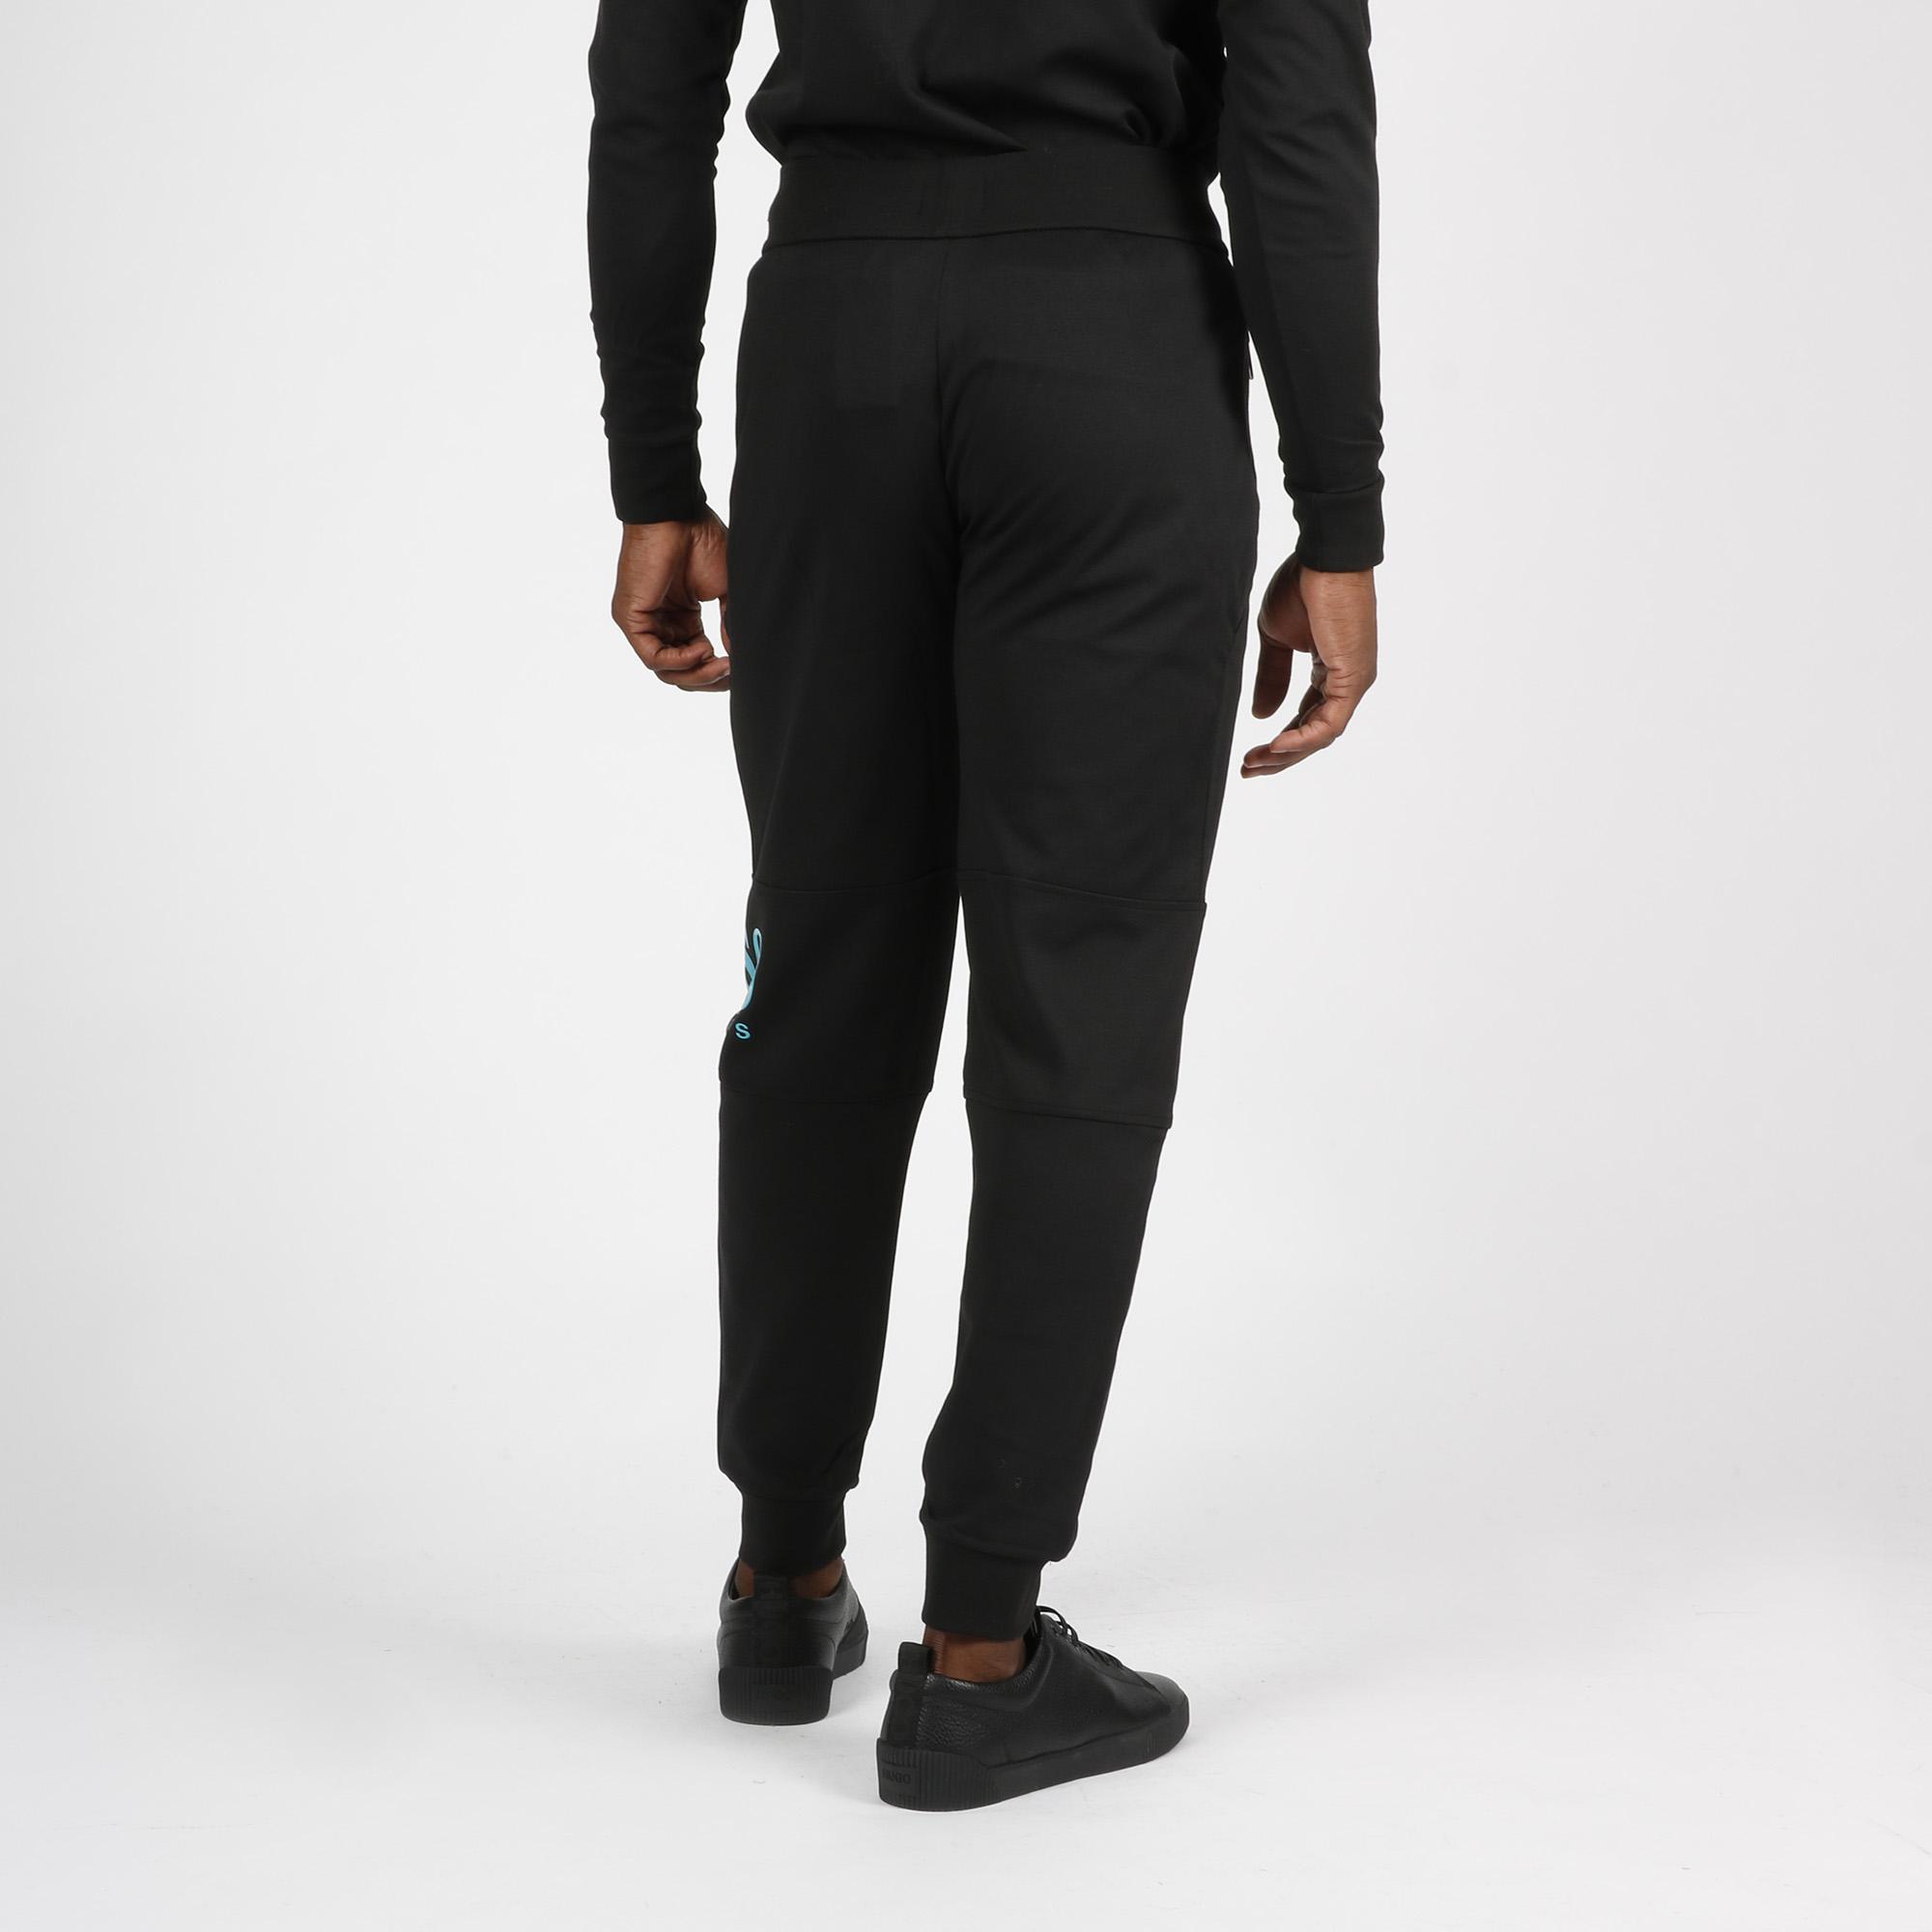 Pantalone tuta logo ginocchio - Nero